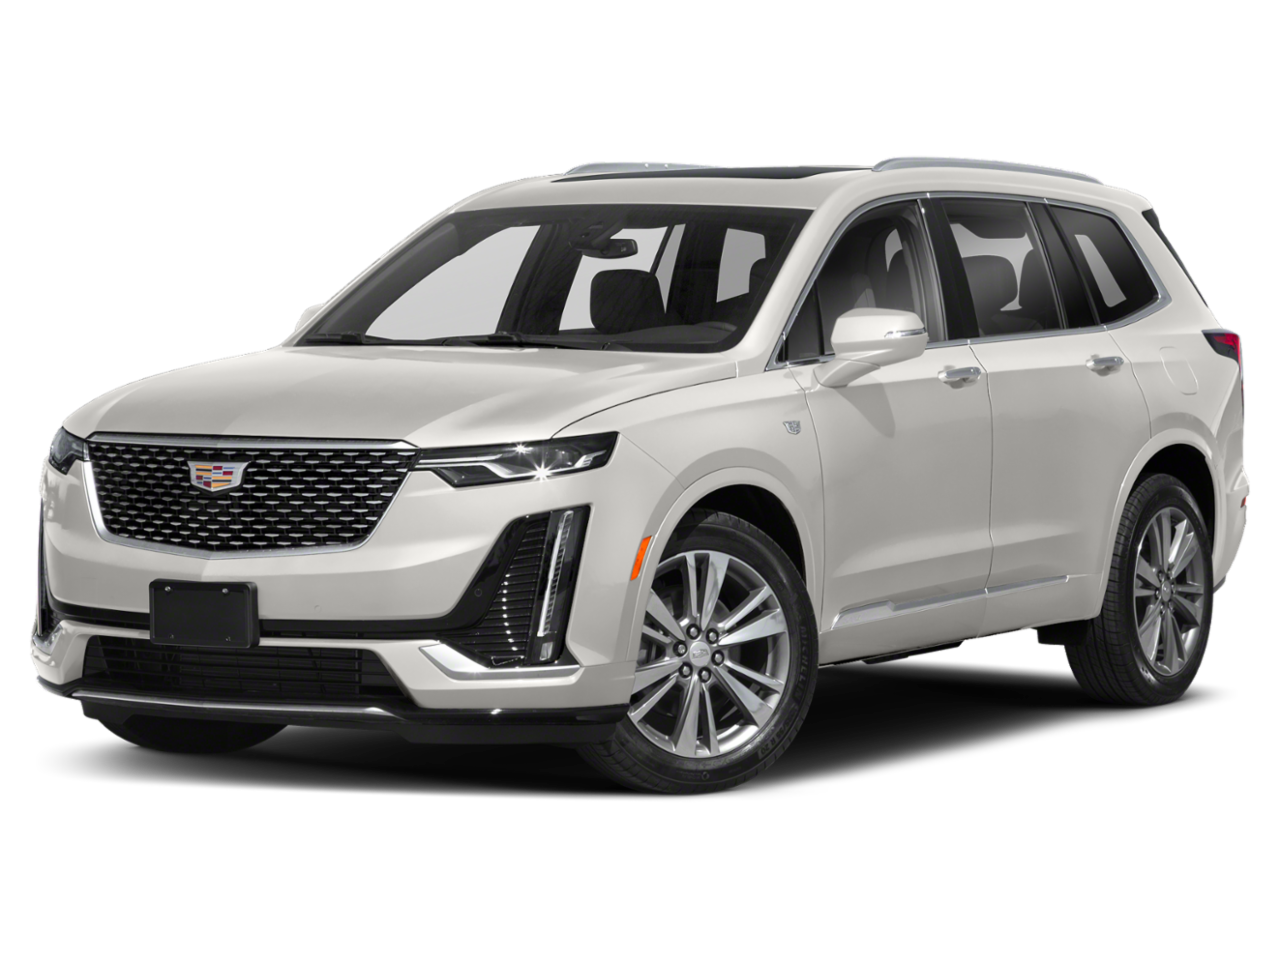 Cadillac 2022 XT6 Premium Luxury